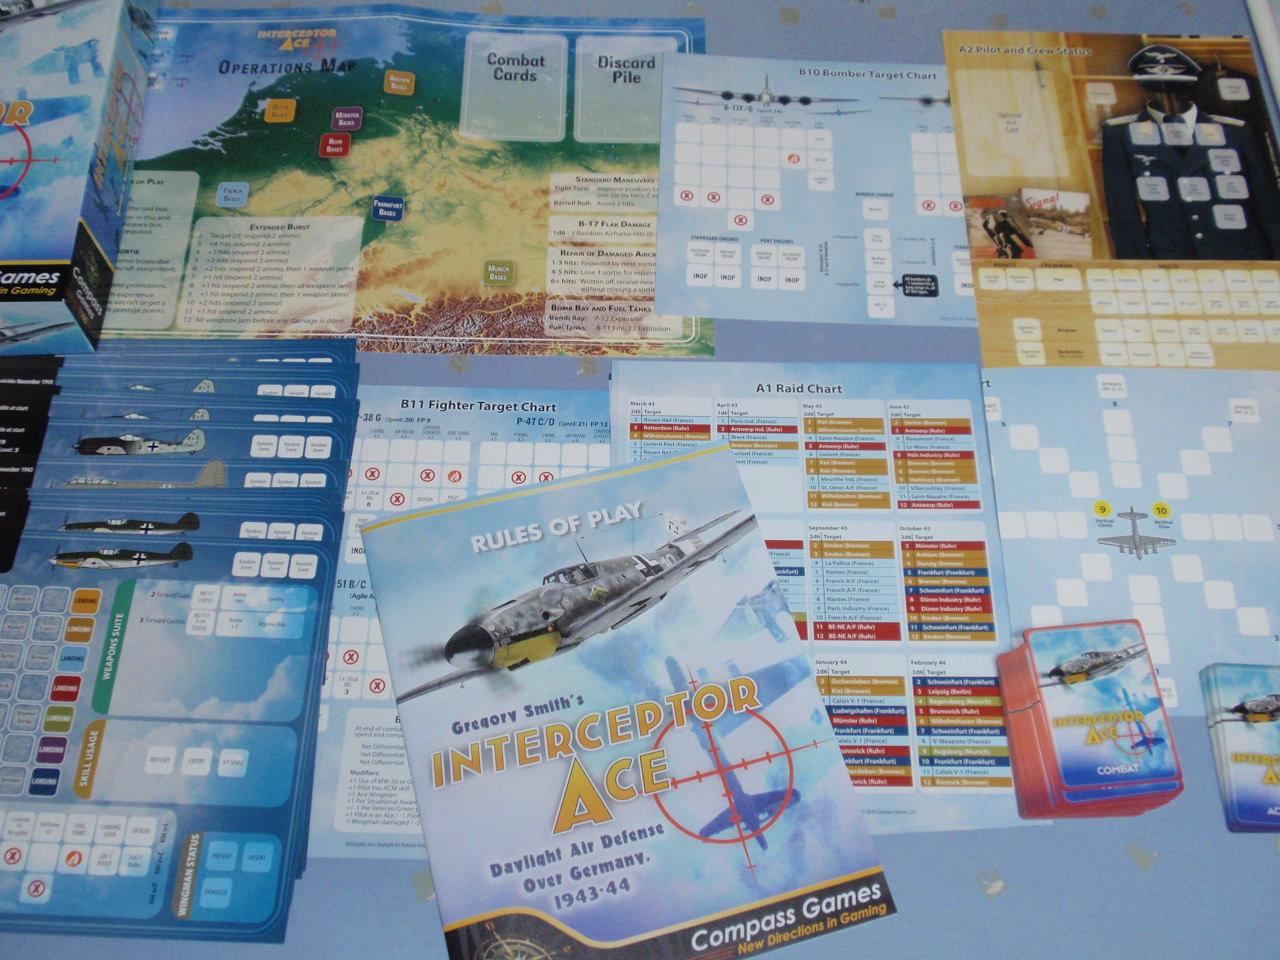 Compass Games「Interceptor Ace」を準備中_b0162202_2093687.jpg